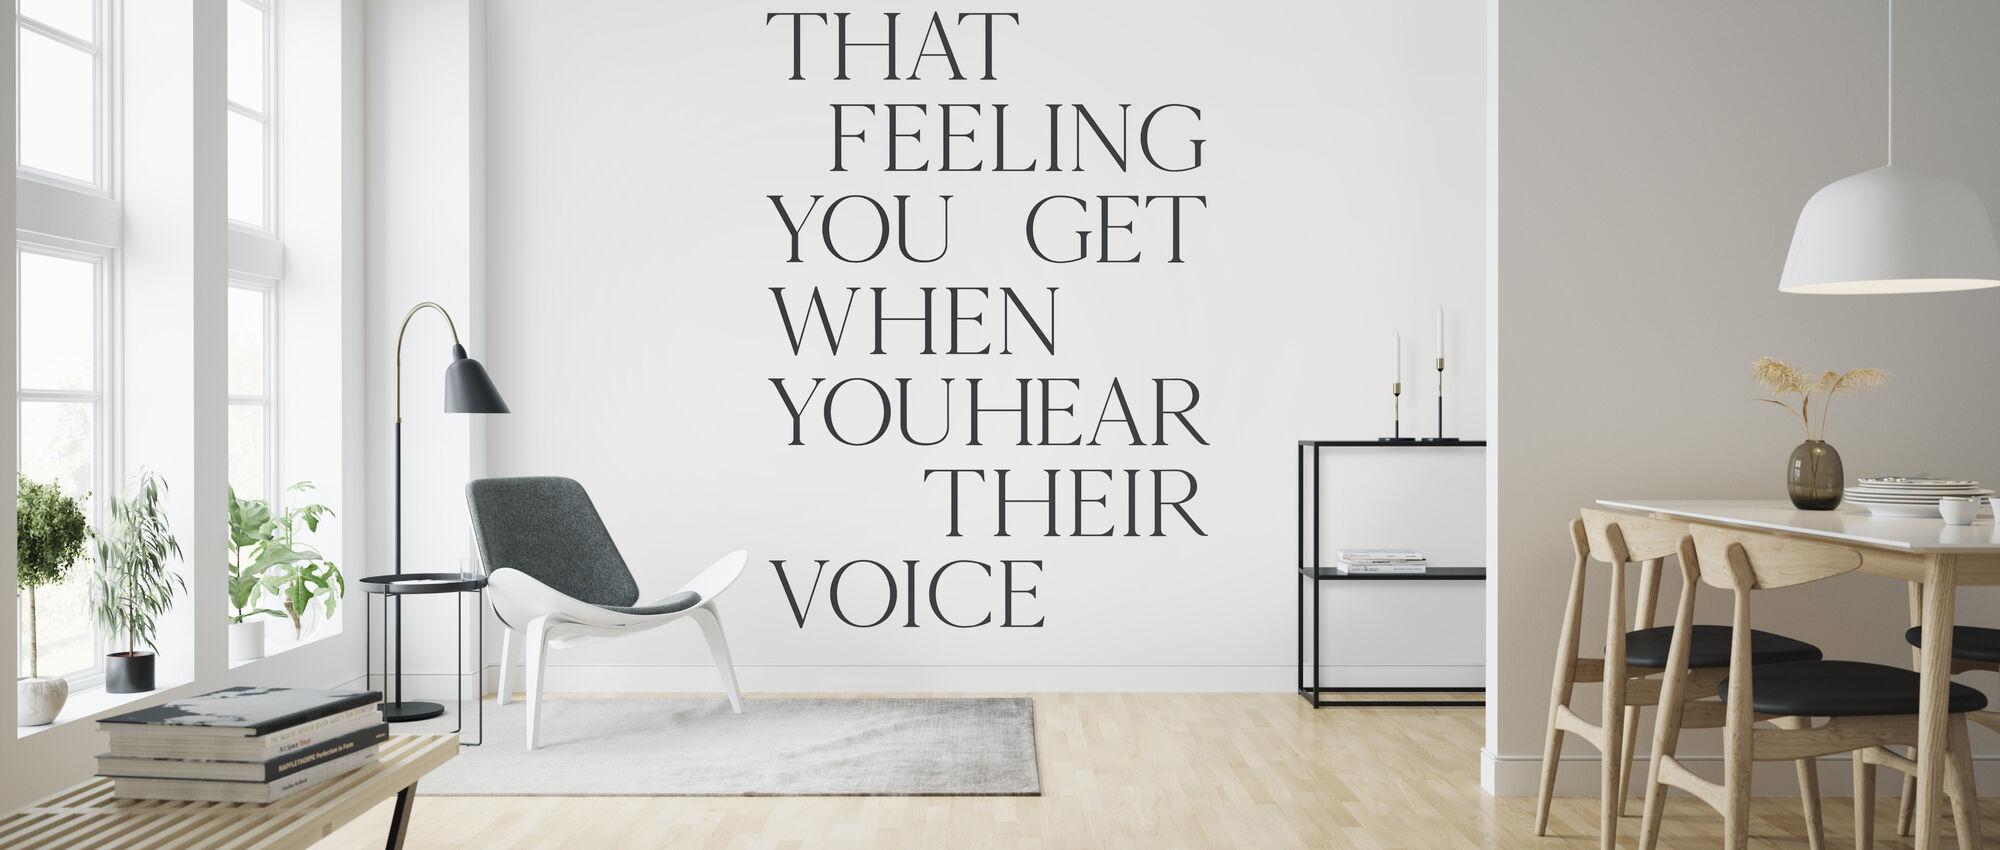 That Feeling You Get - Wallpaper - Living Room